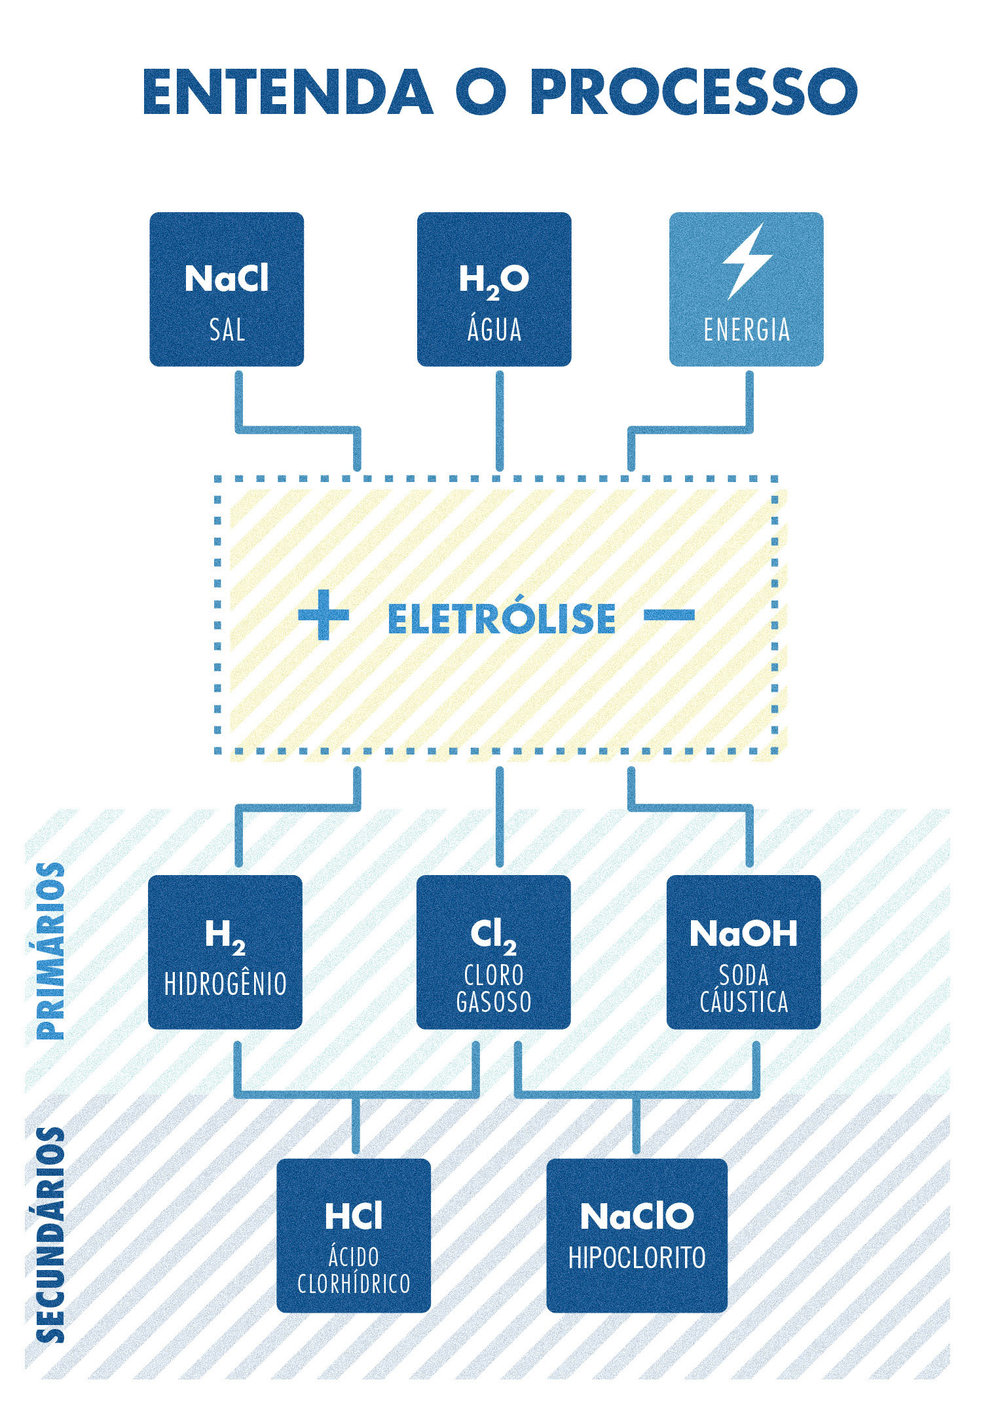 processo quimico pt.jpg